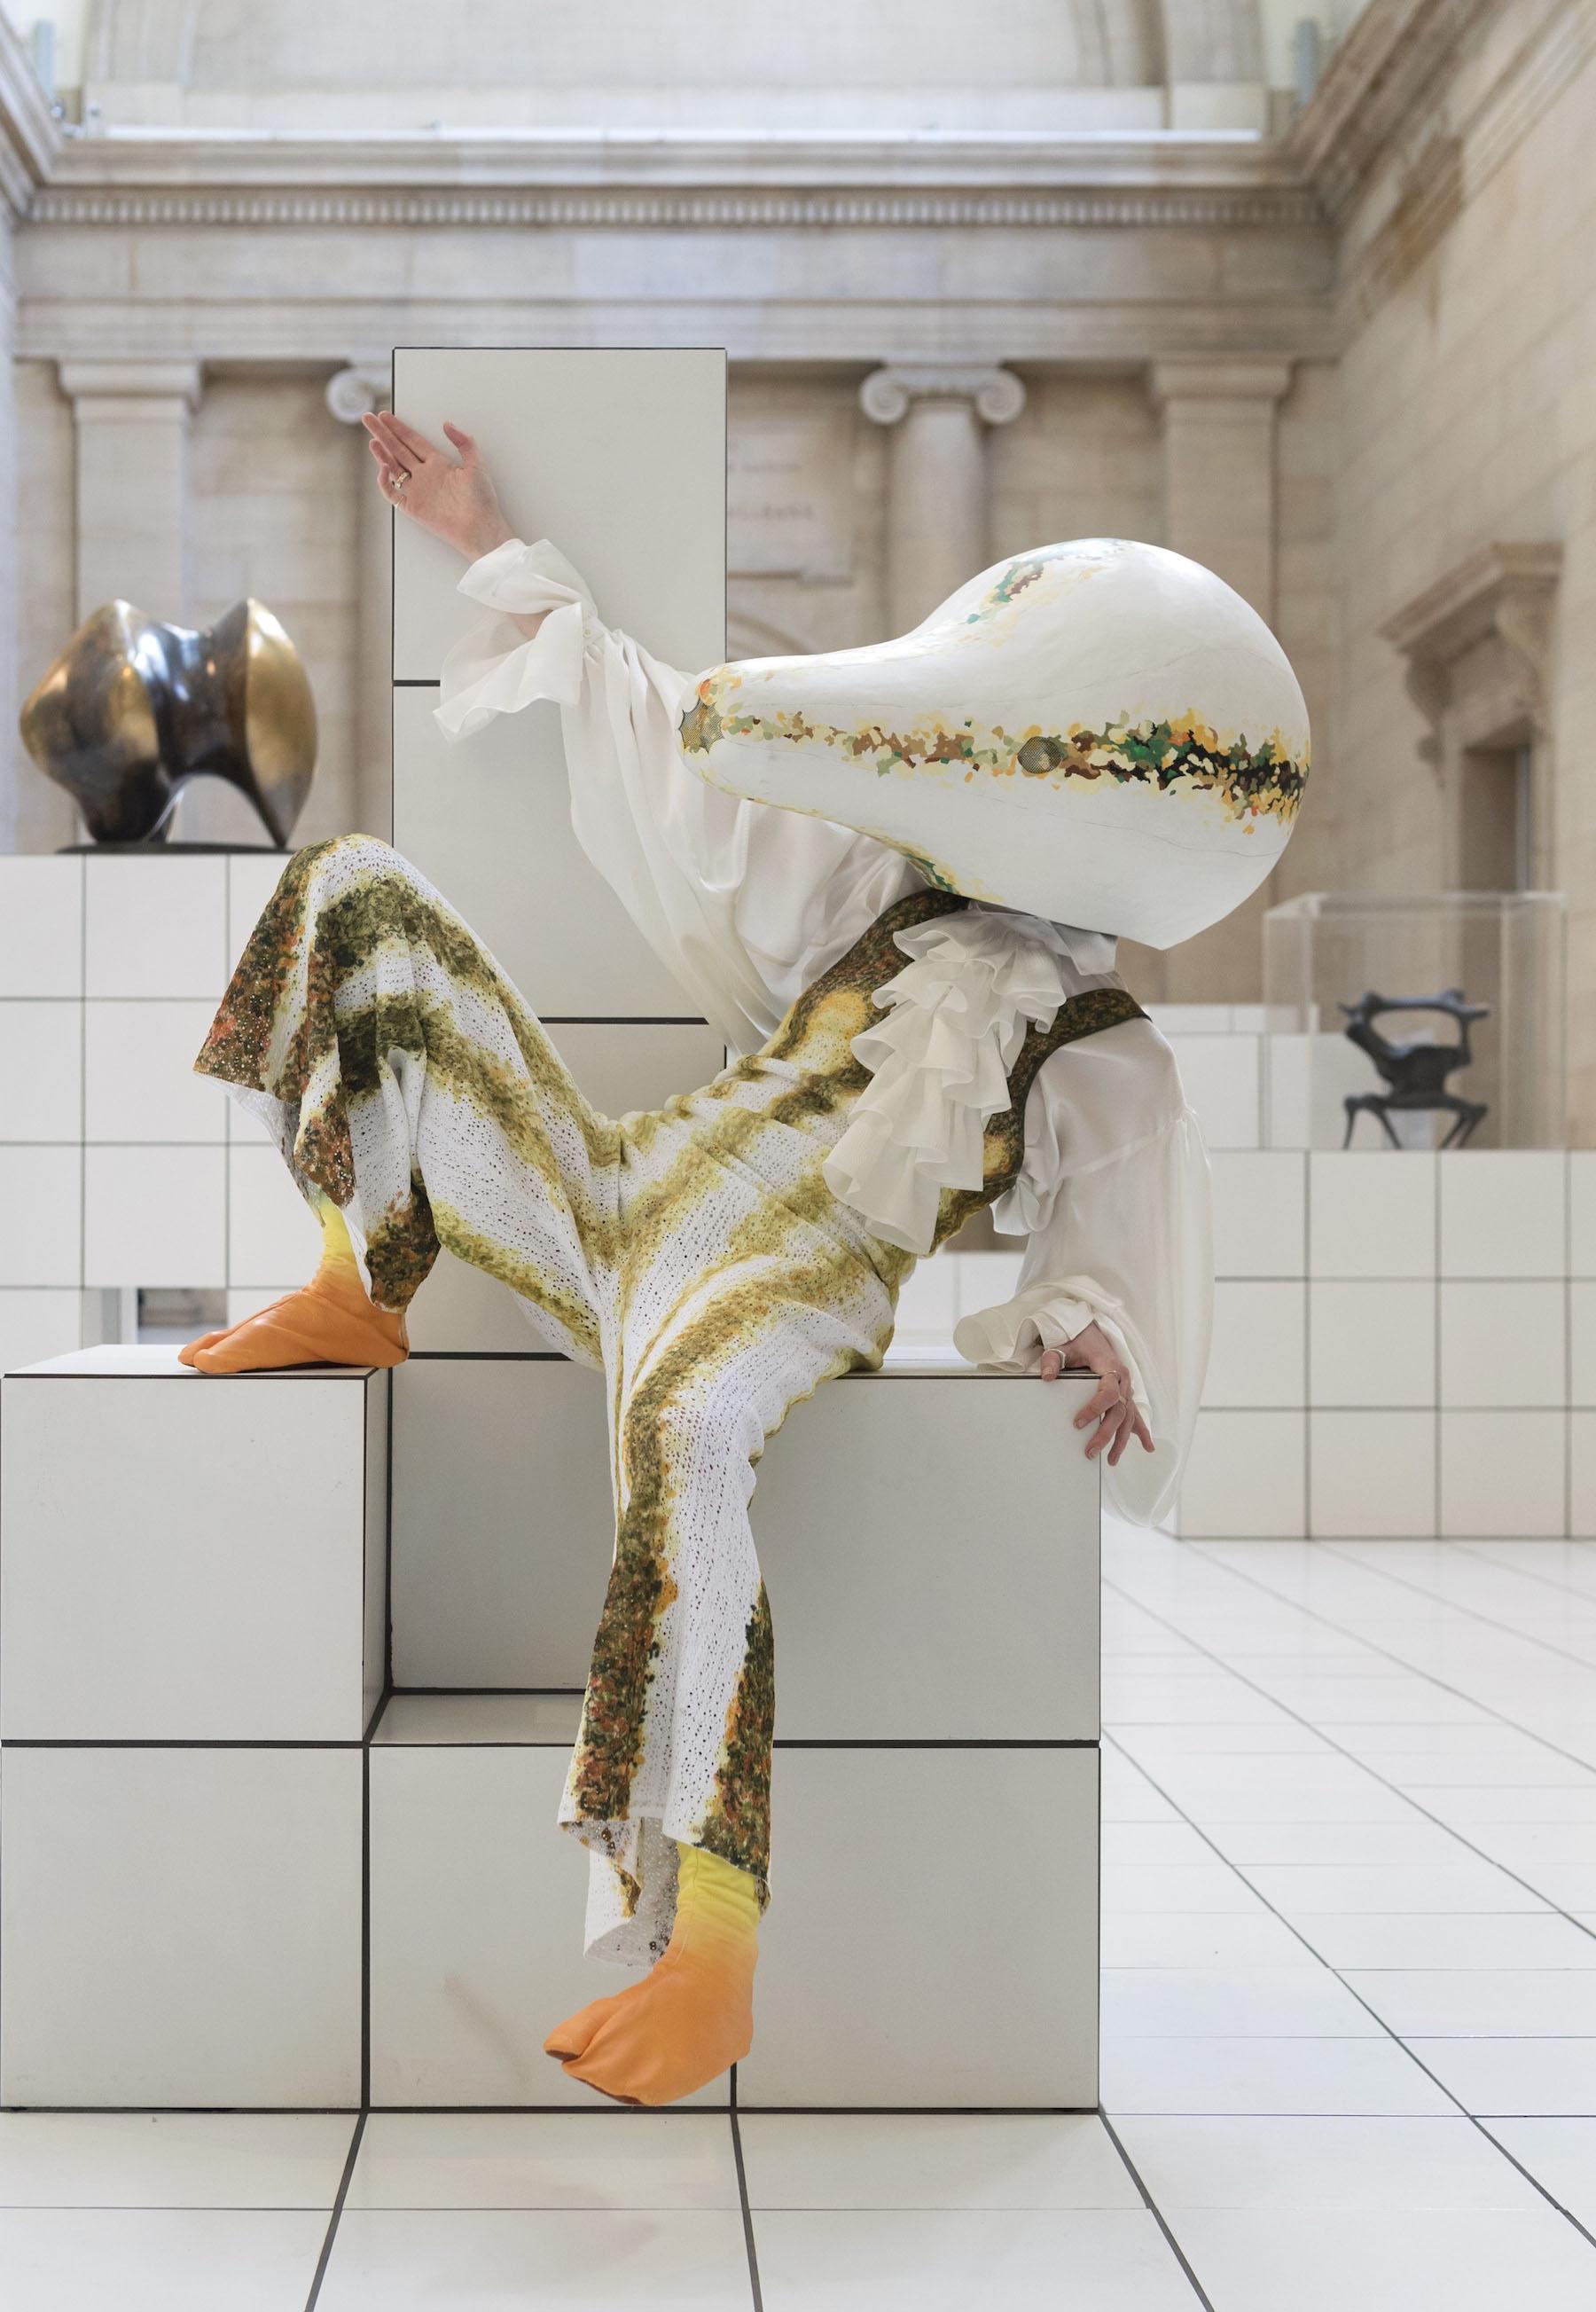 iGNANT-Fashion-Jonathan -Anderson-Anthea-Hamilton-The-Squash-05